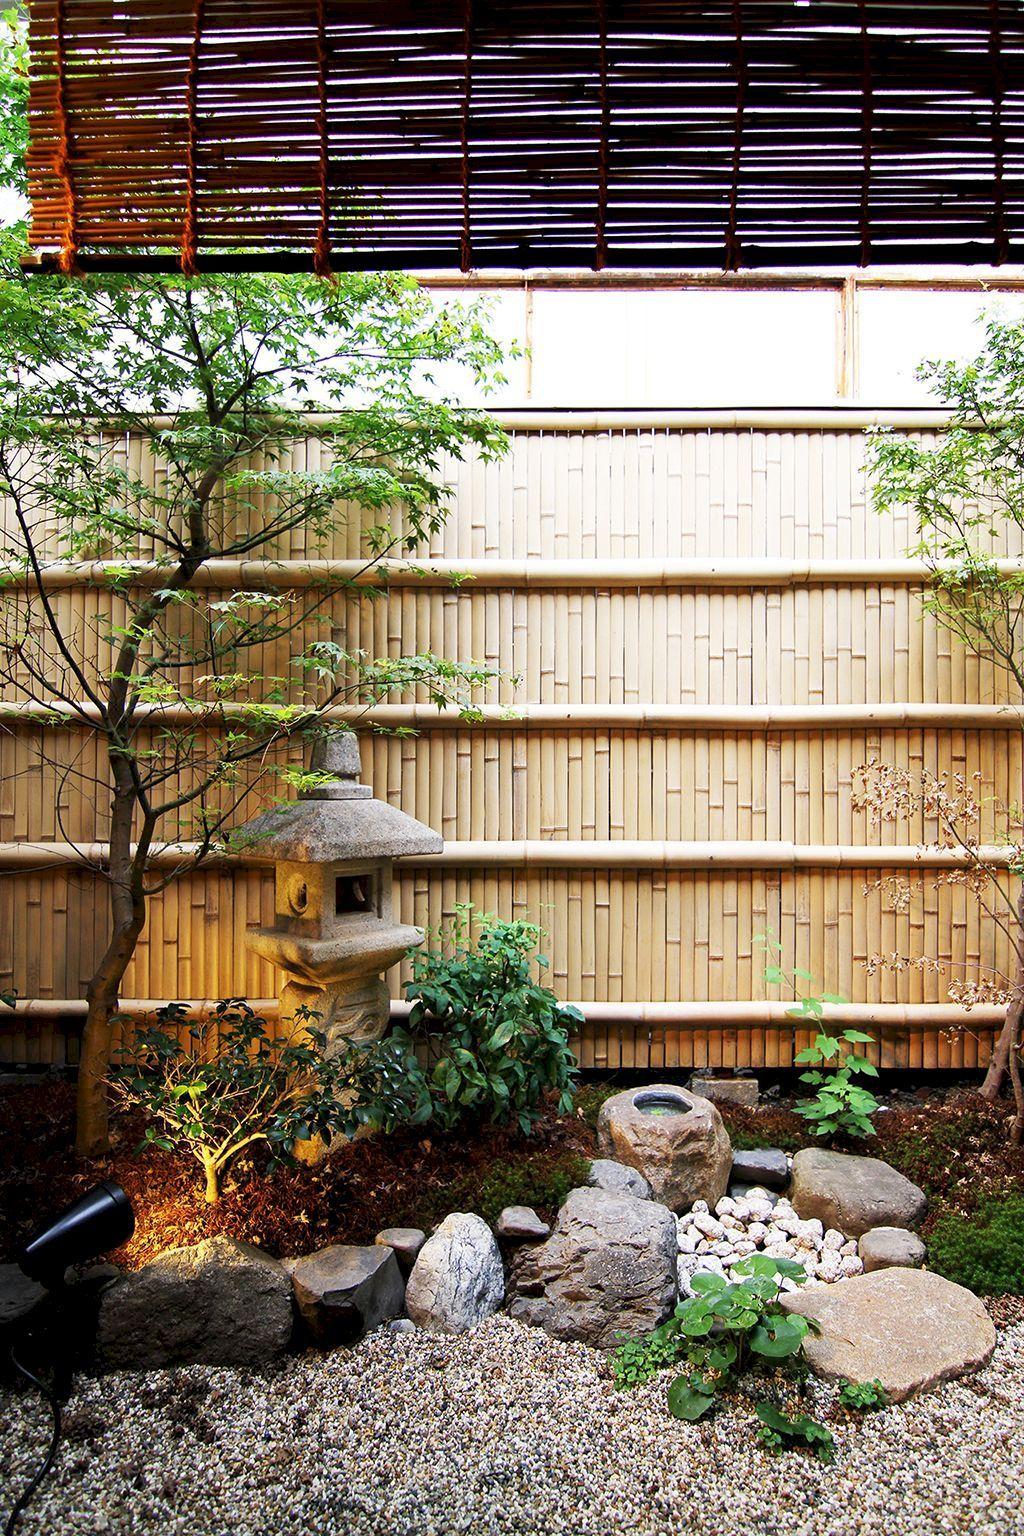 75 Front Yard Rock Garden Landscaping Ideas | Zen garden ... on Zen Front Yard Ideas id=47296